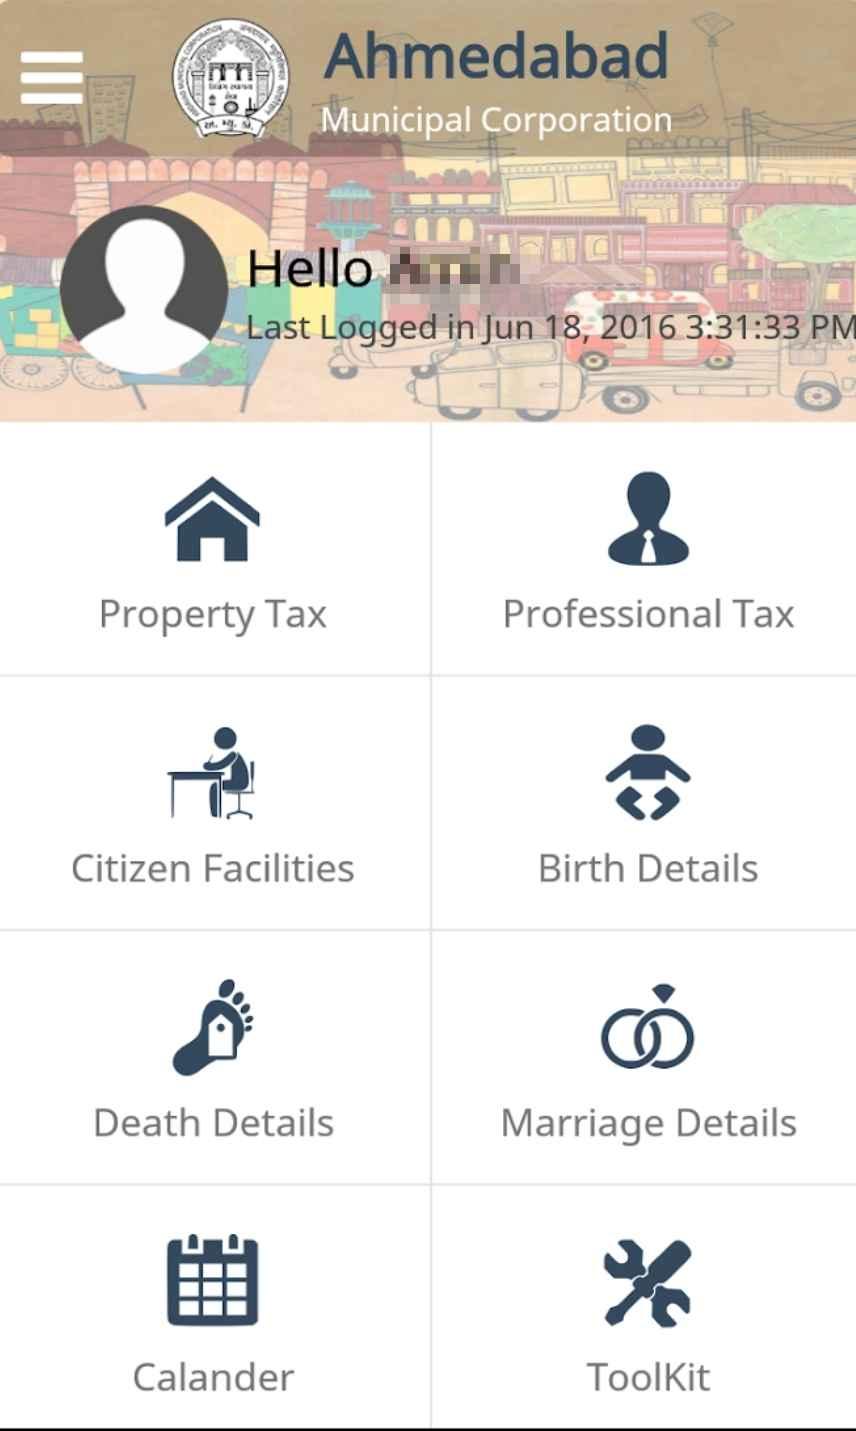 Mobile App - AMC Property Tax Payment - Online